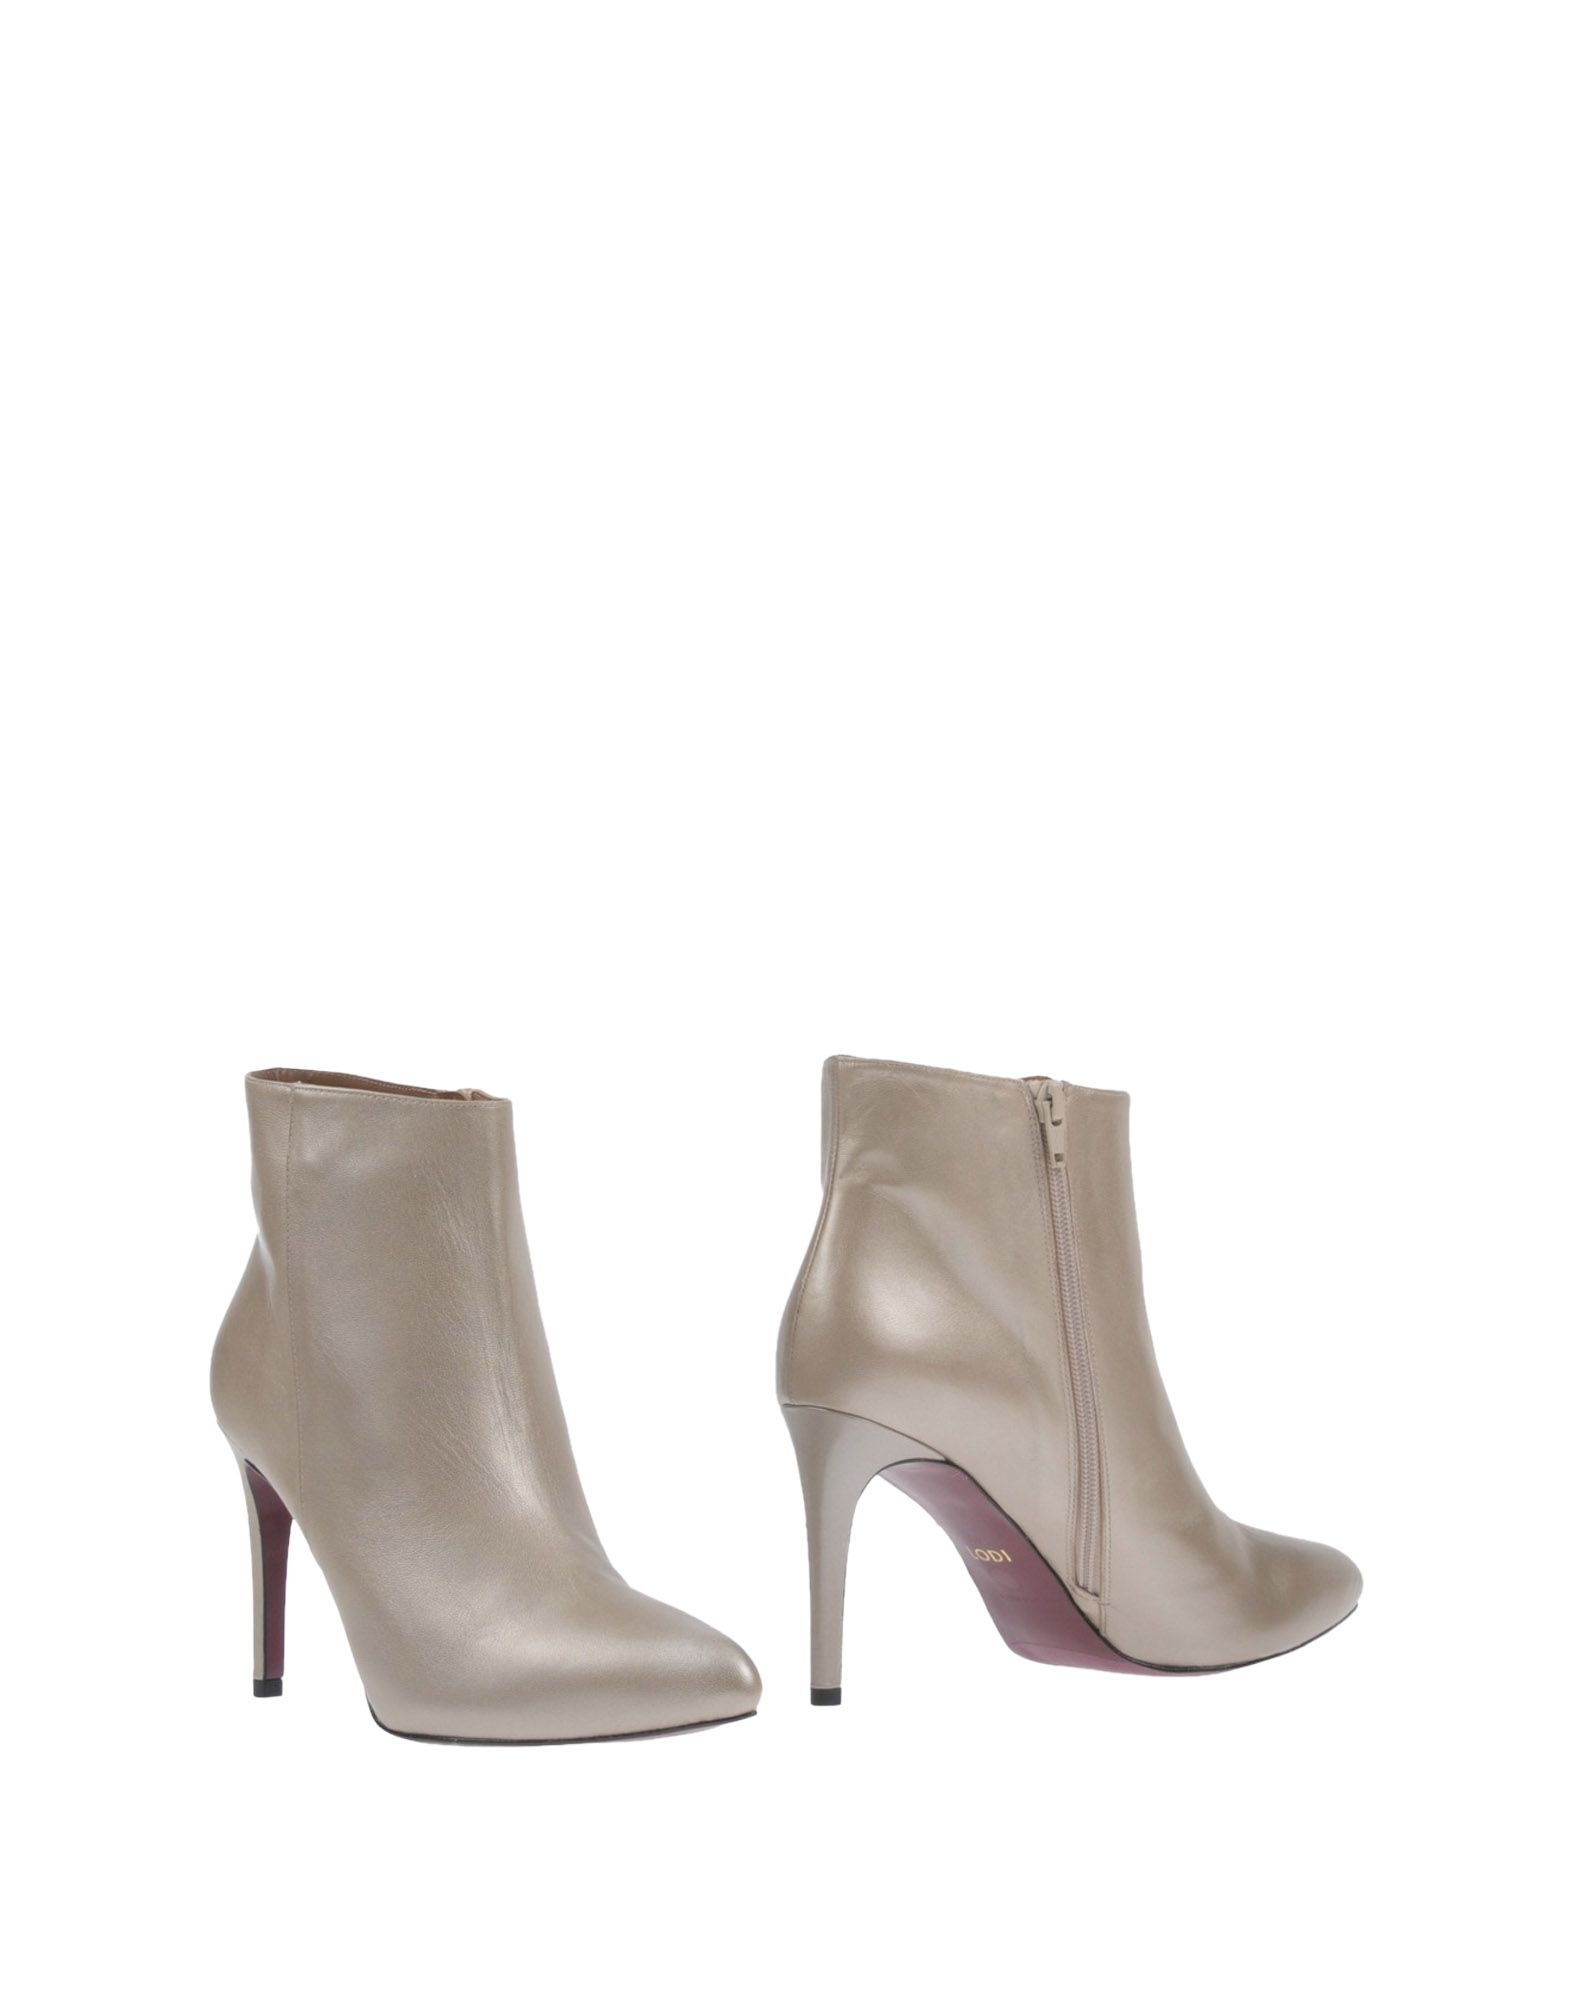 Lodi Stiefelette Damen  11455108NJ Gute Qualität beliebte Schuhe